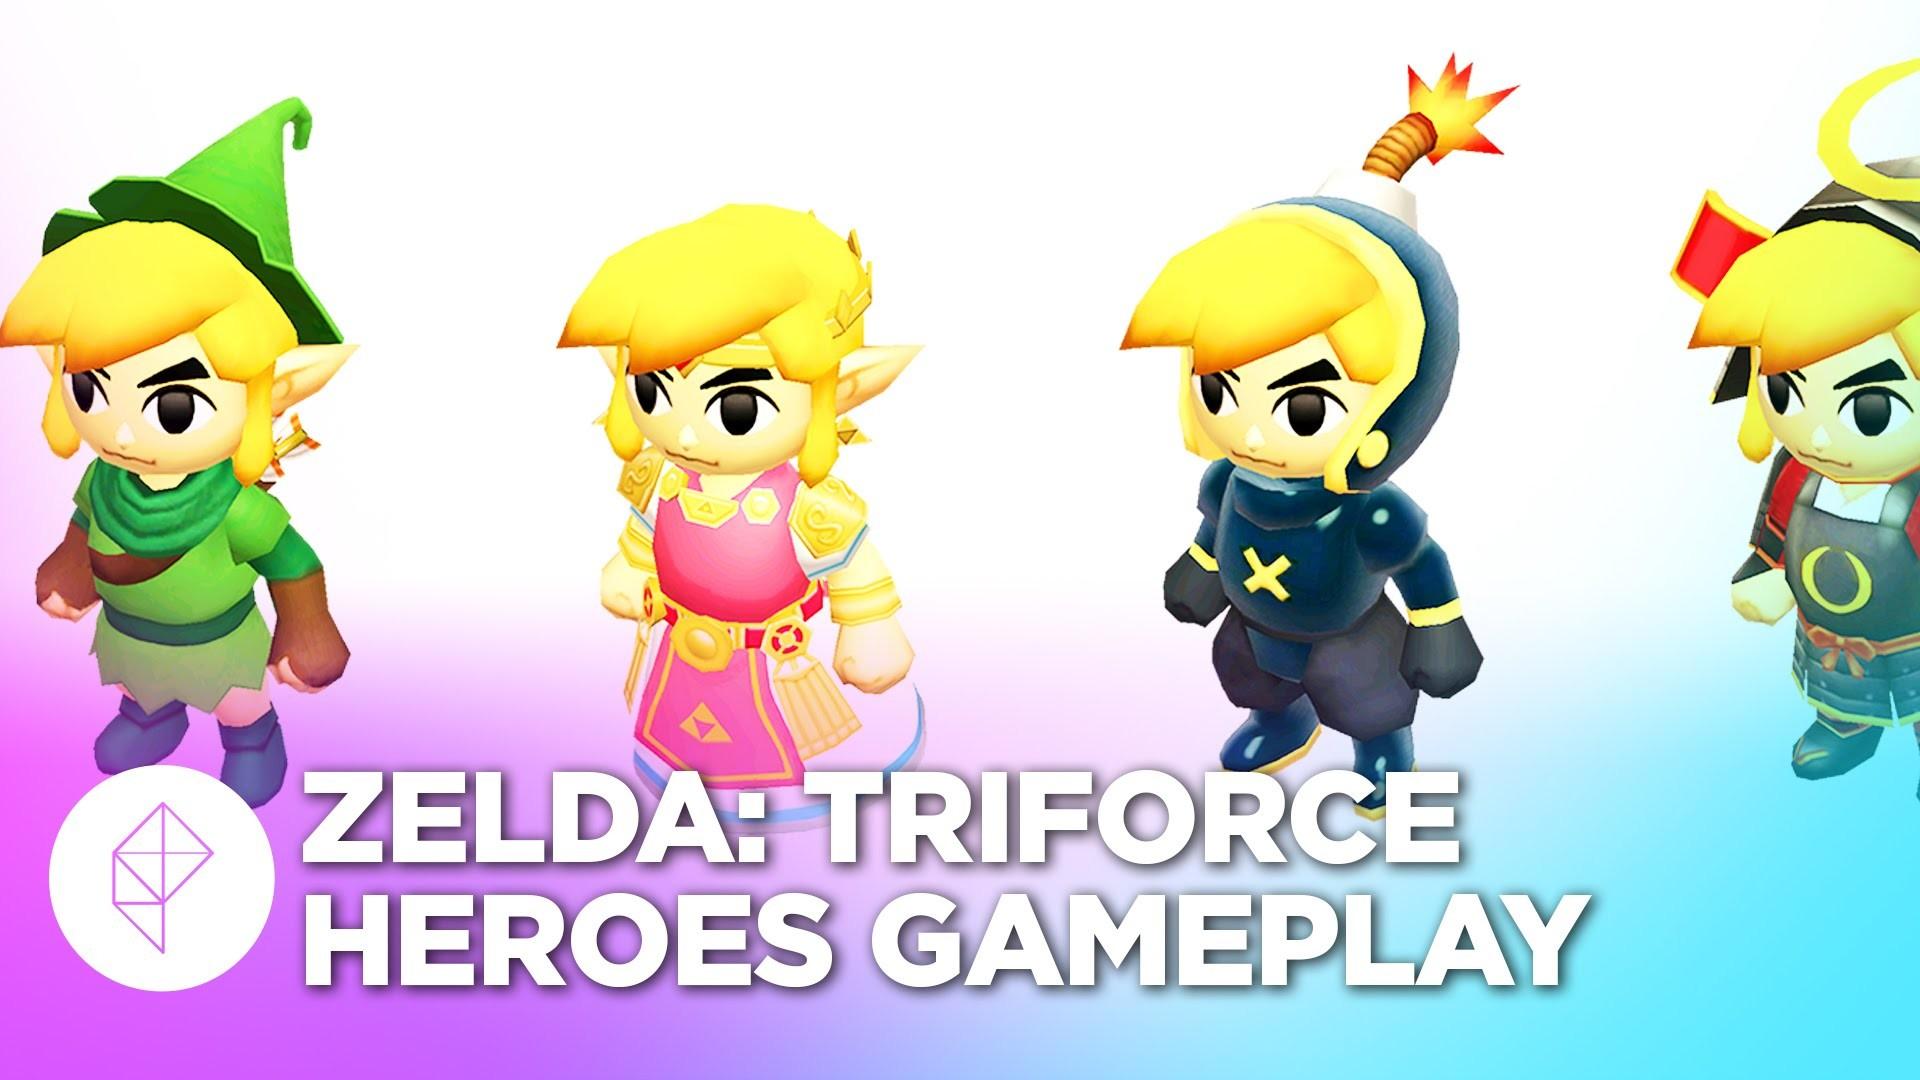 Res: 1920x1080, Zelda: Triforce Heroes Gameplay - Snowball Ravine